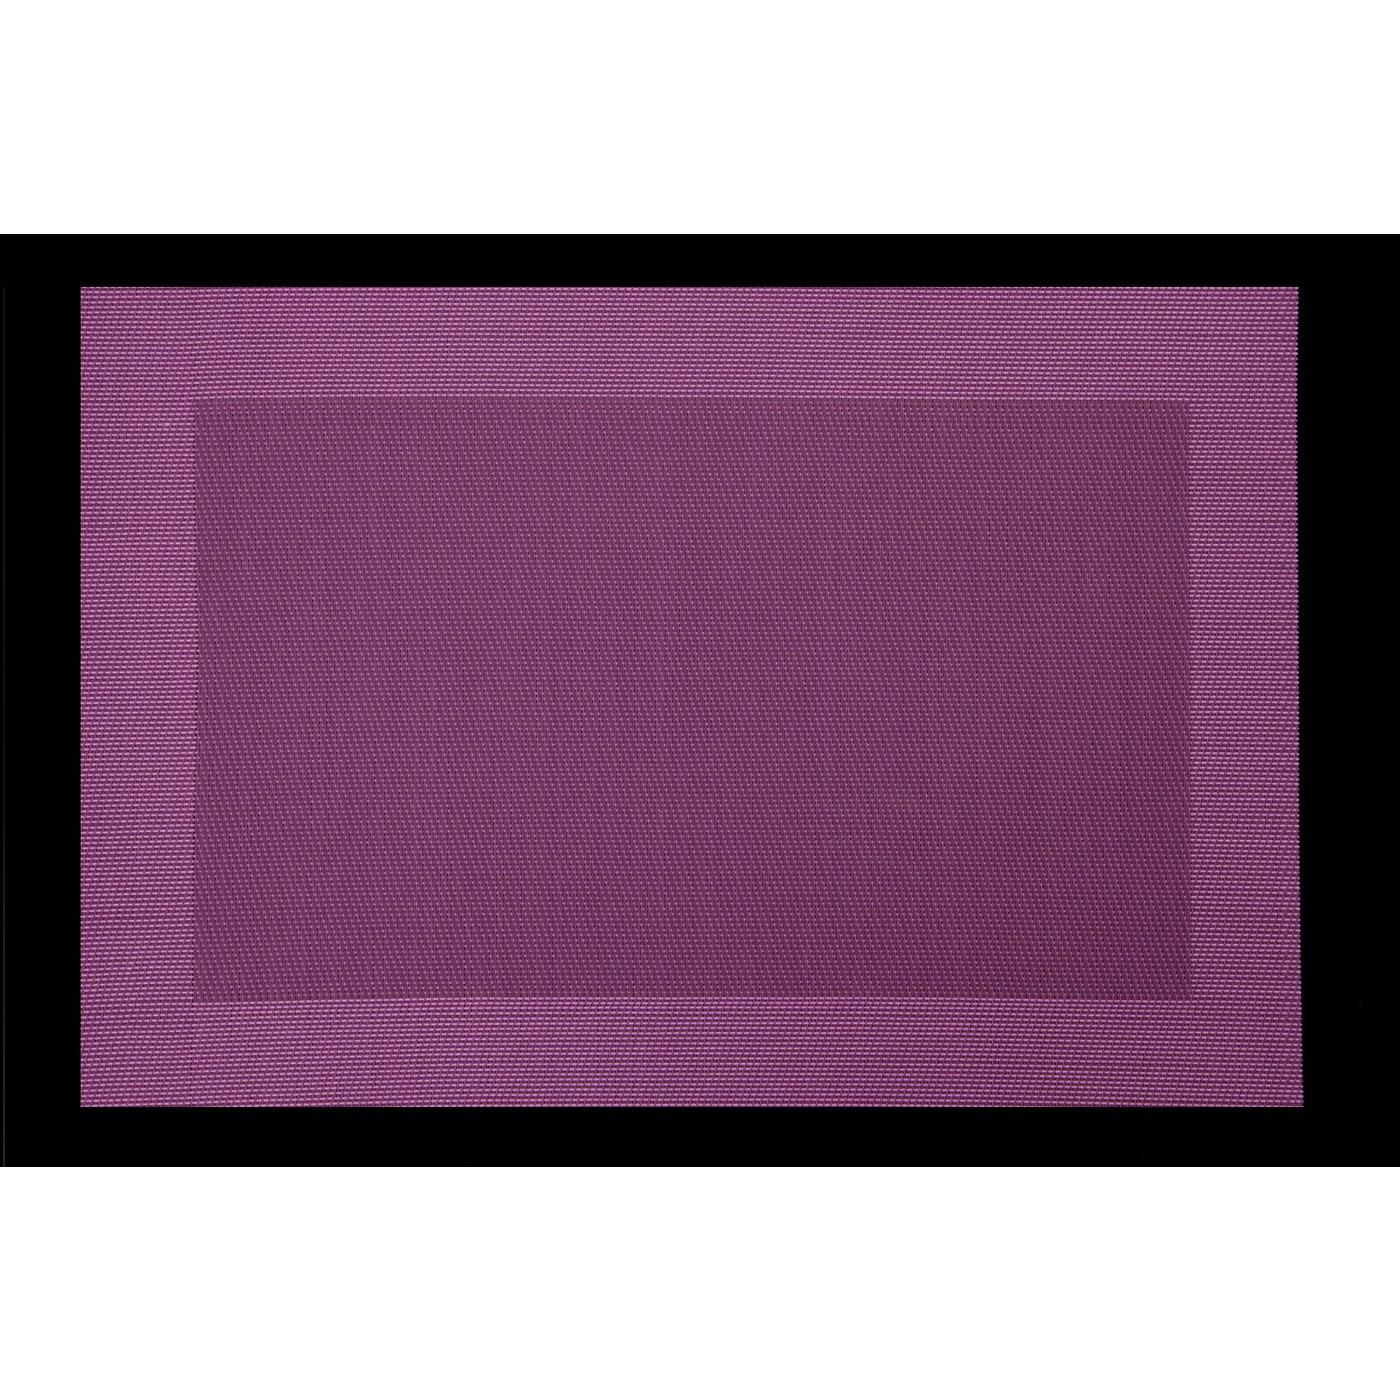 Fioletowa mata stołowa struktura tkaniny 30x45 cm